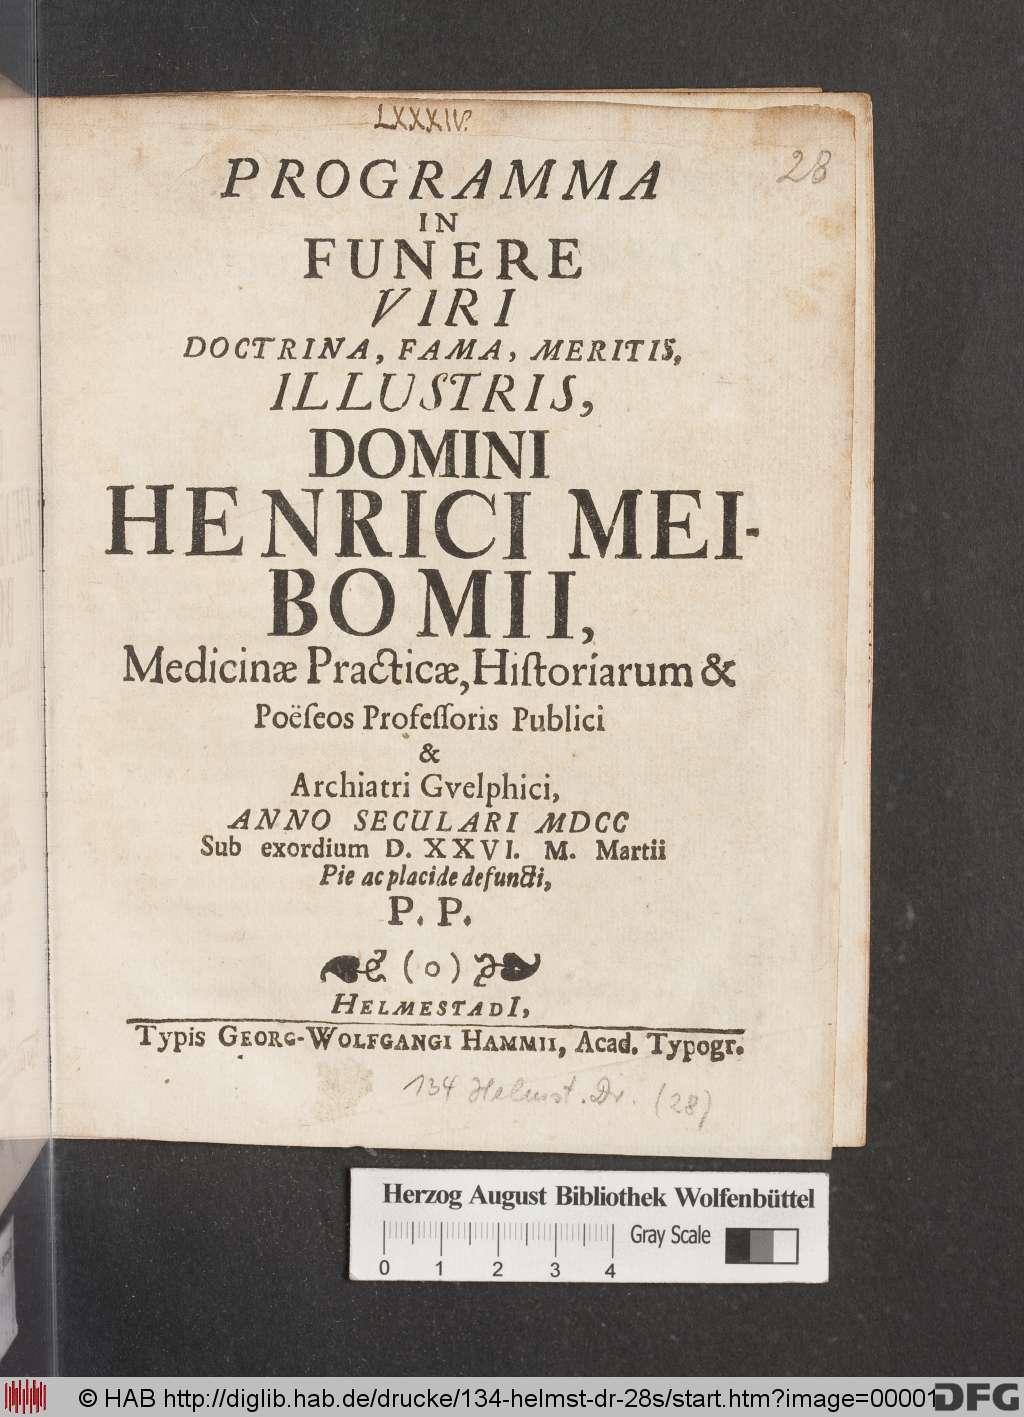 http://diglib.hab.de/drucke/134-helmst-dr-28s/00001.jpg